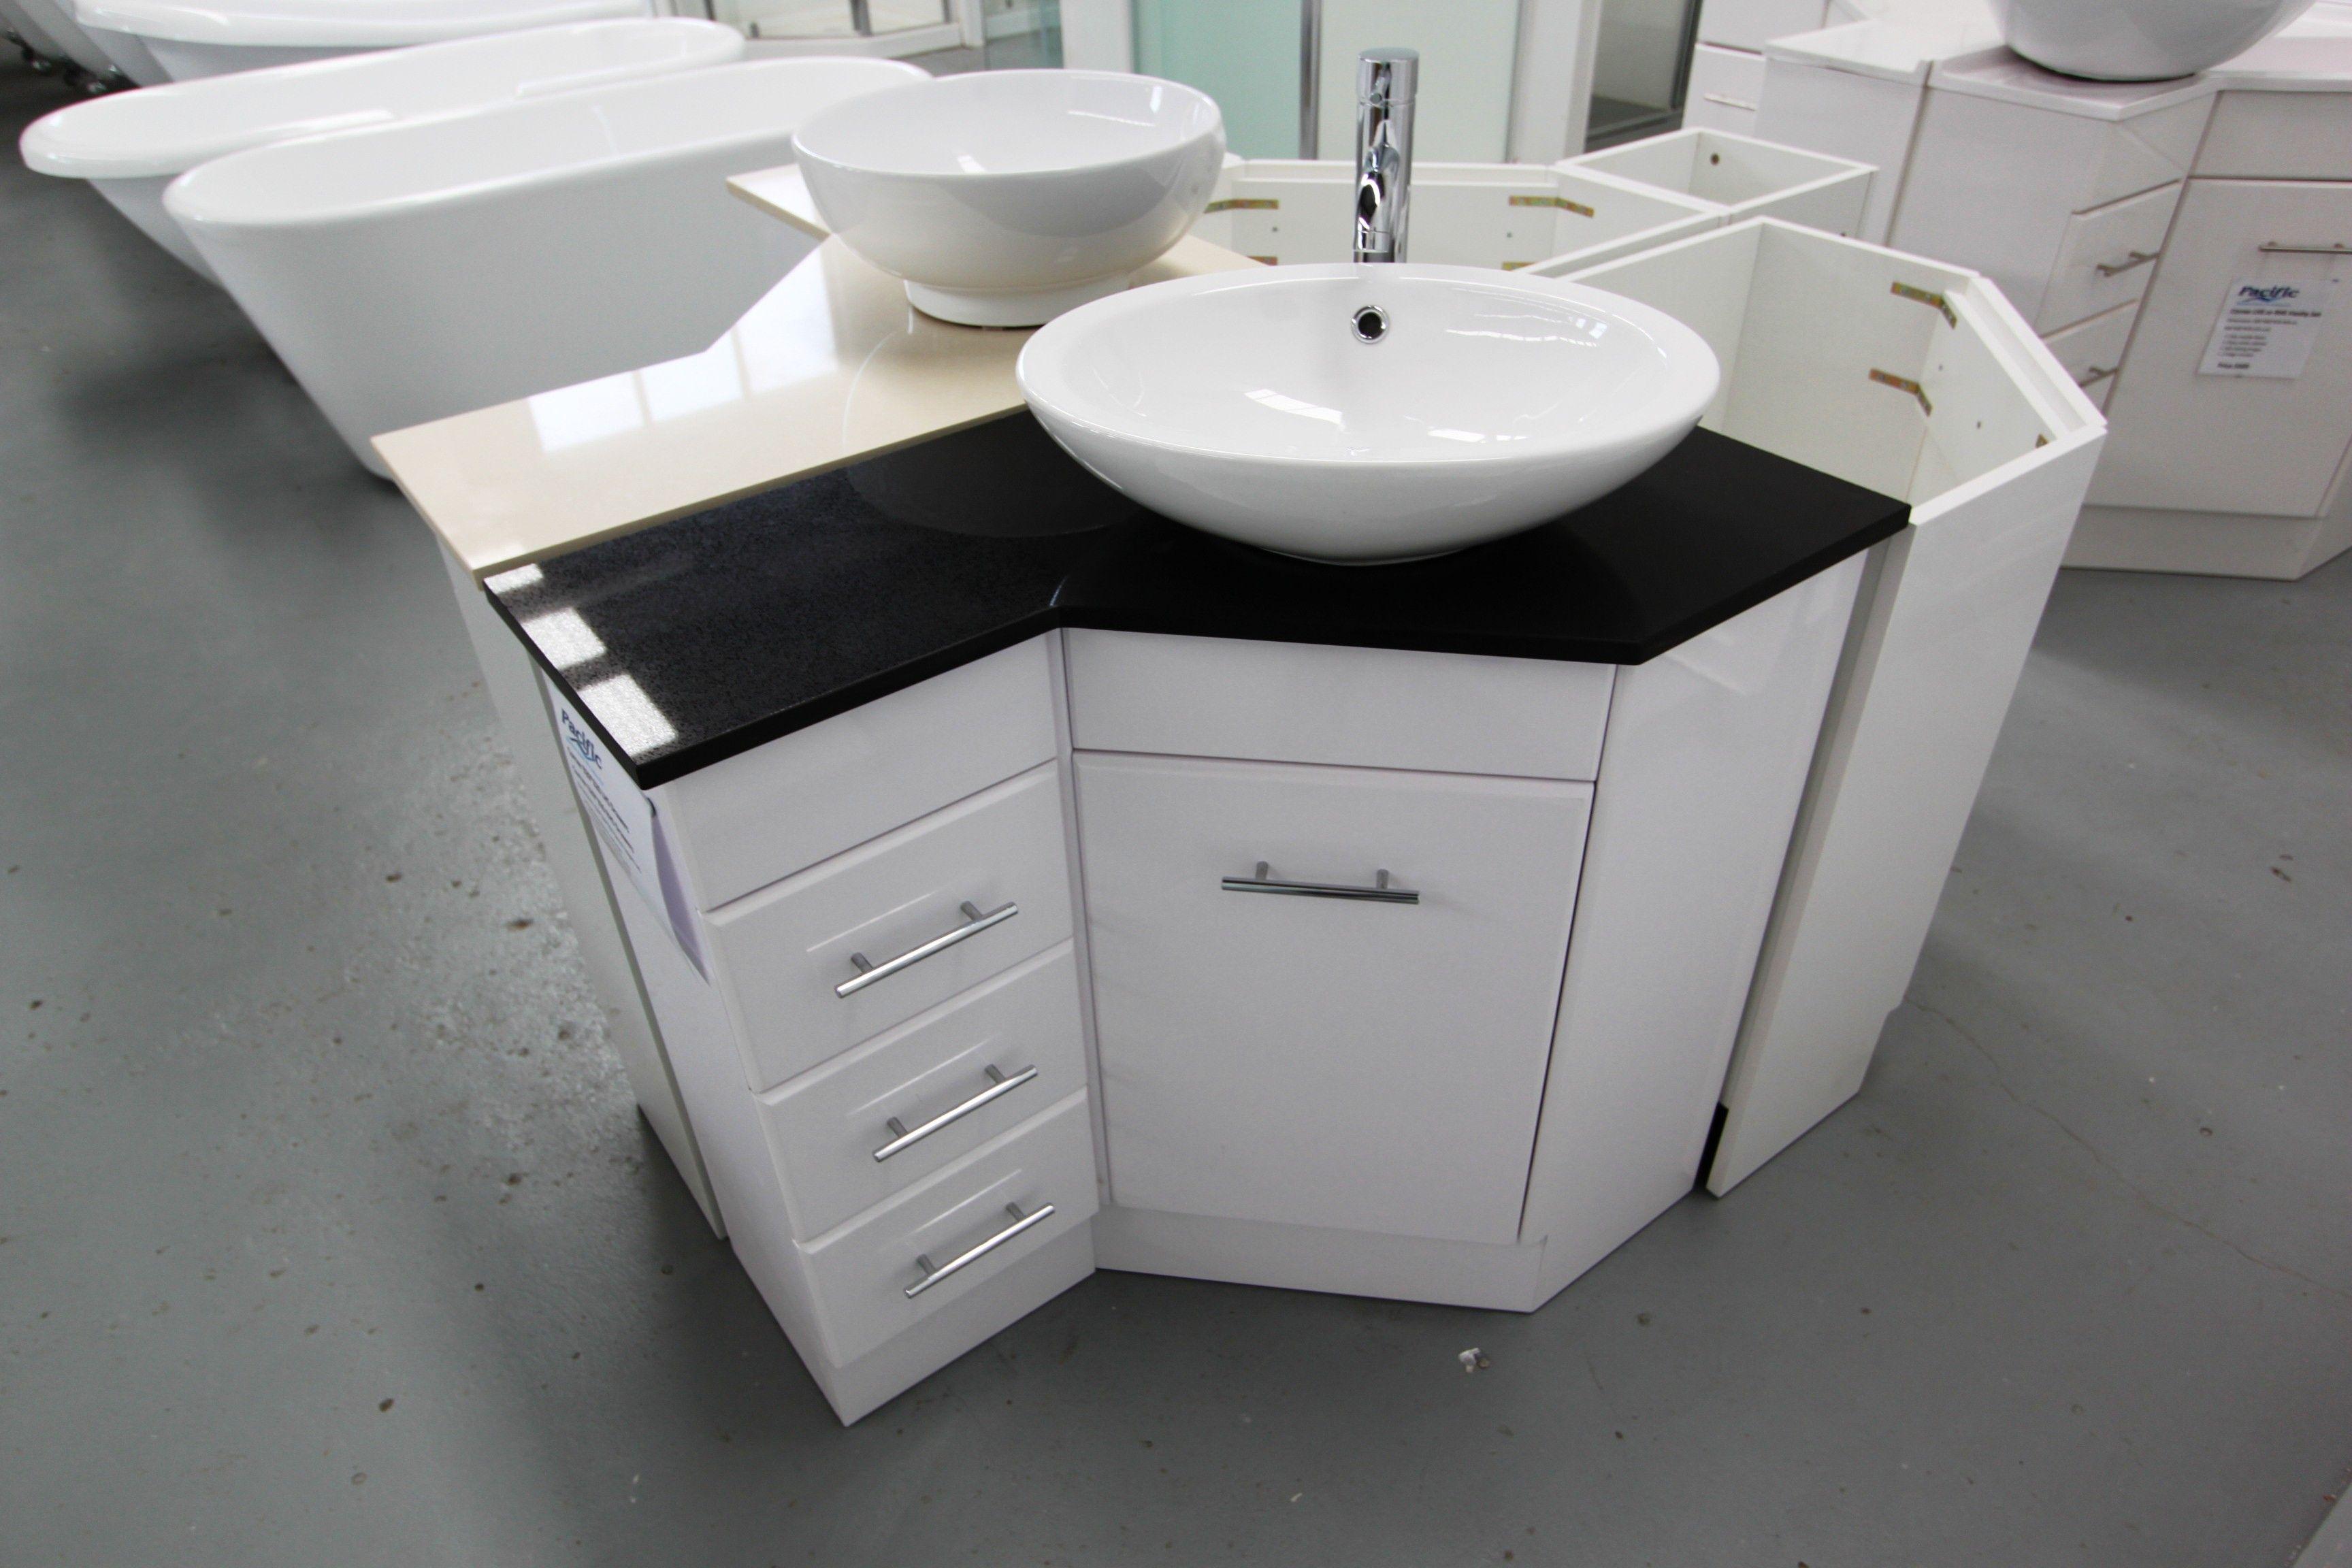 Space Saver Corner Bathroom Vanity Home Depot Bathroom Vanity Corner Bathroom Vanity Home Depot Bathroom